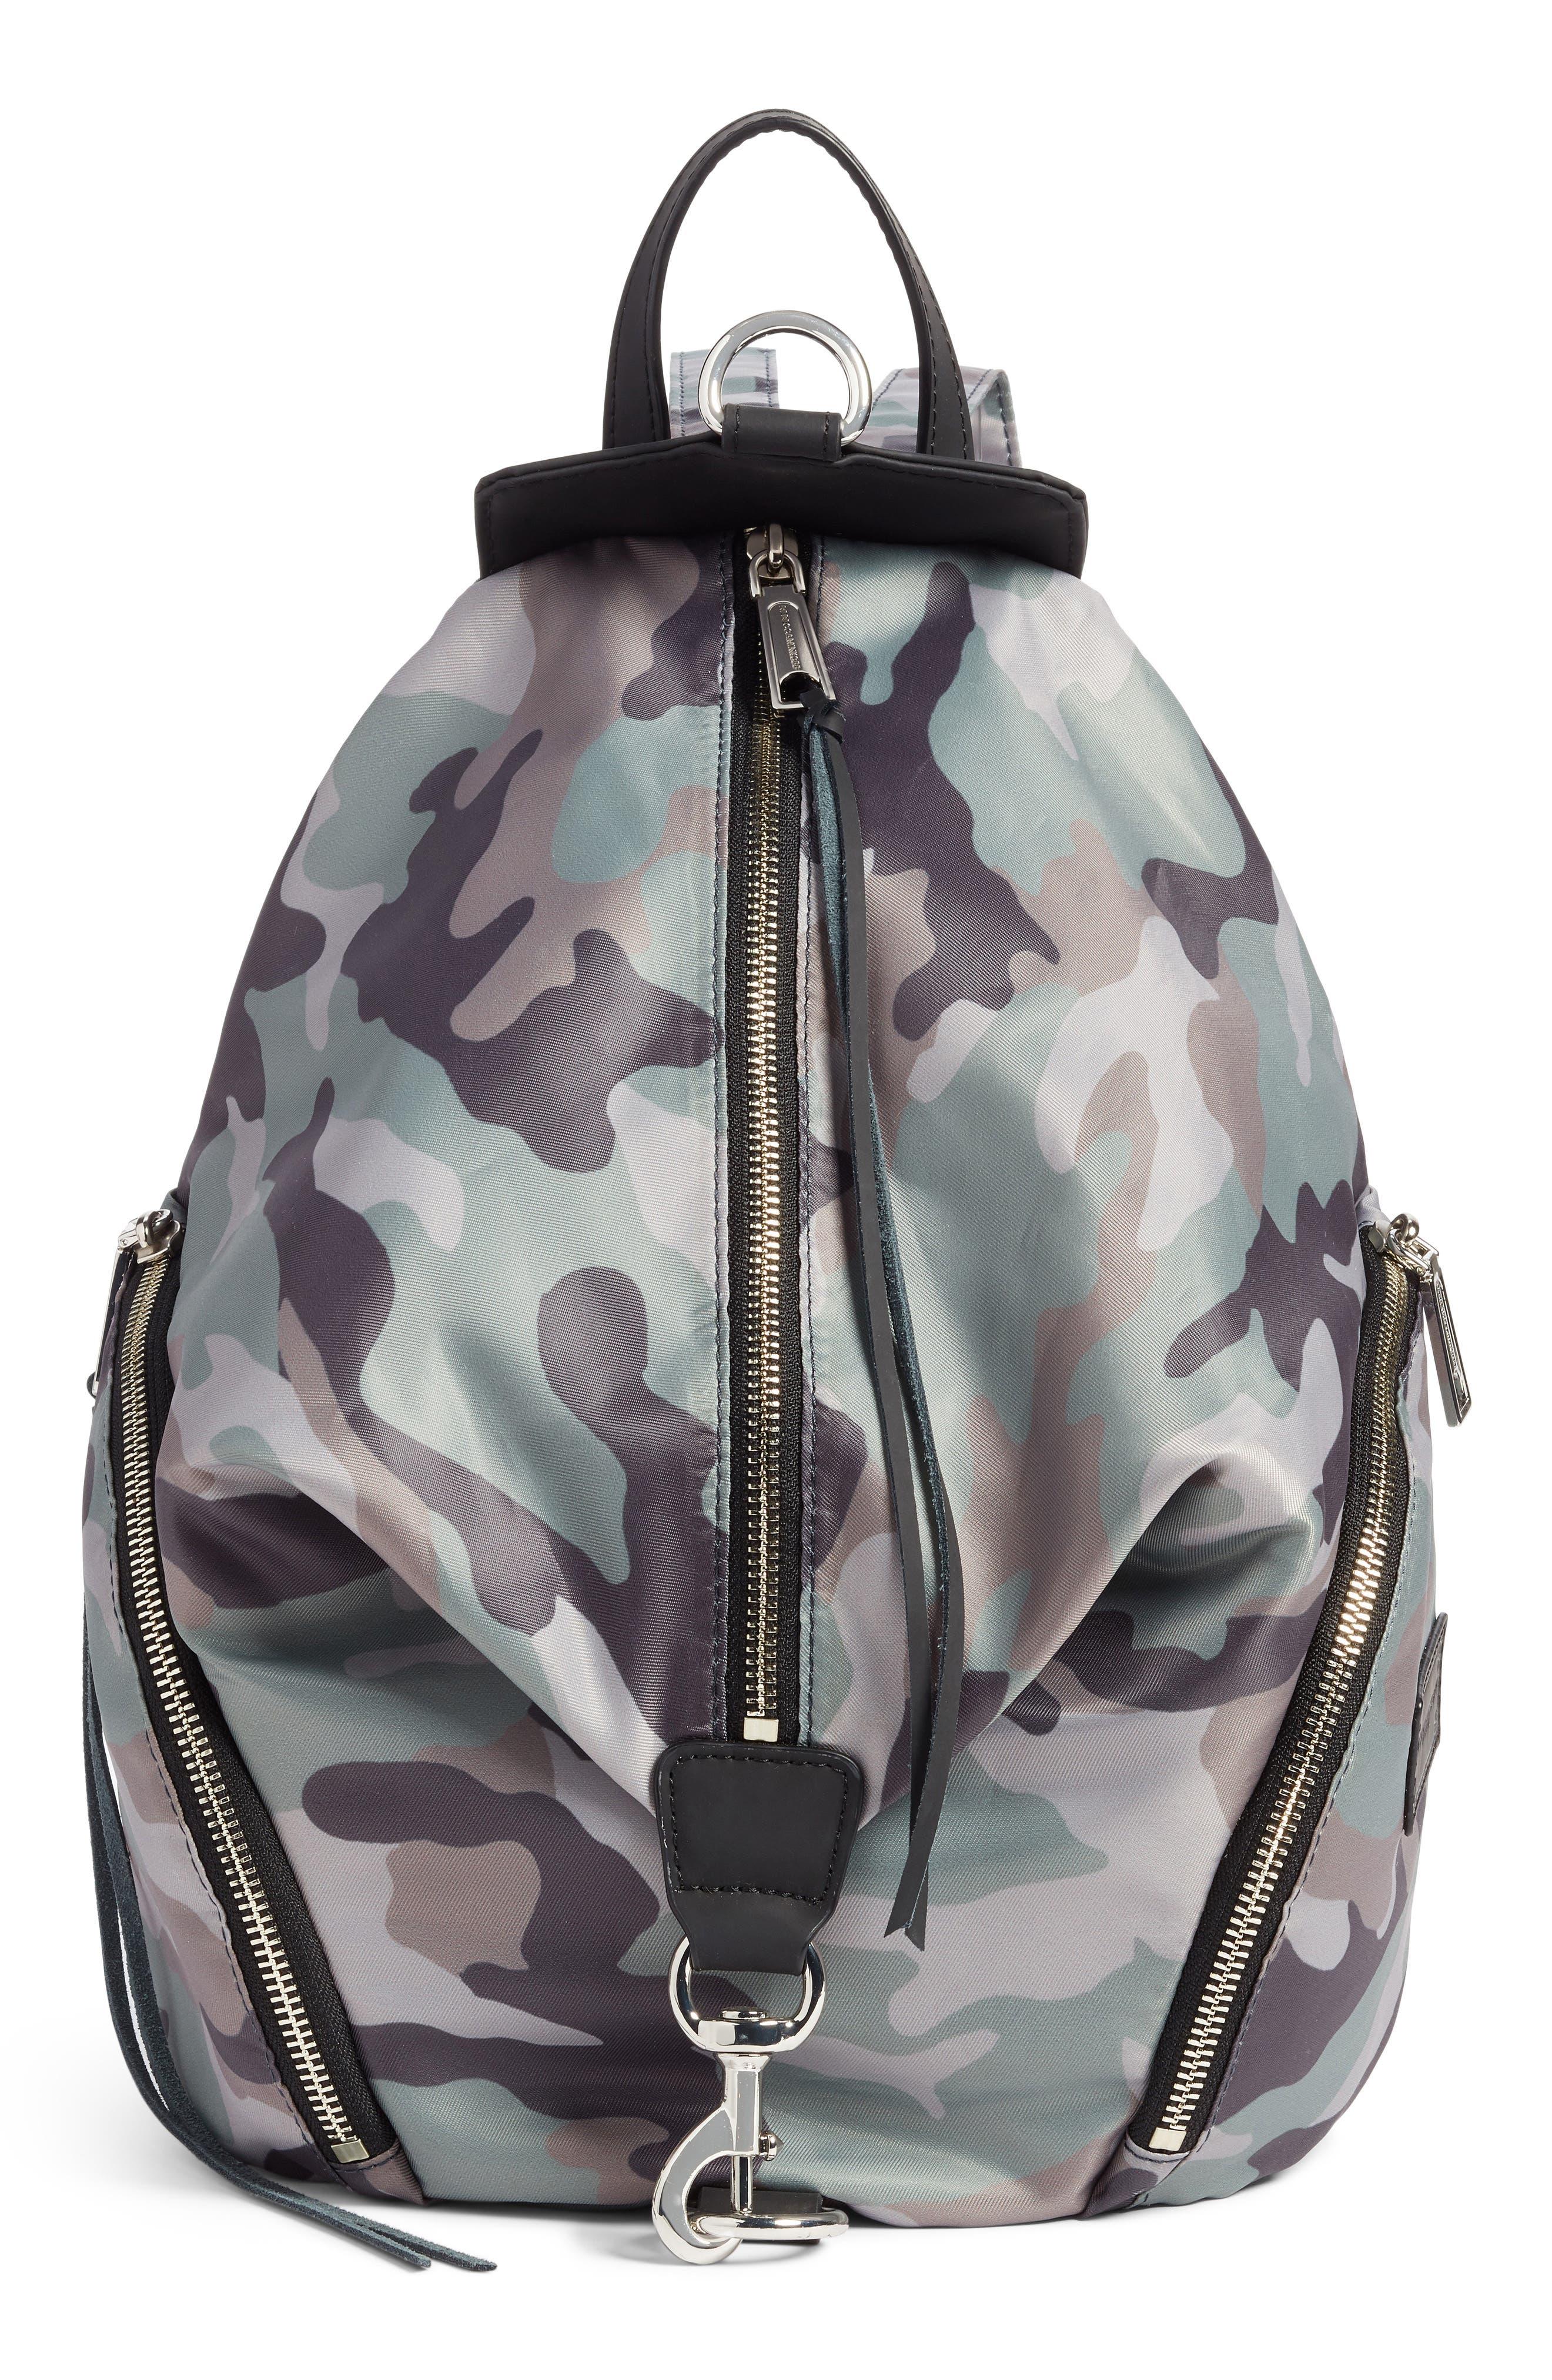 Julian Nylon Backpack - Green in Camo Print